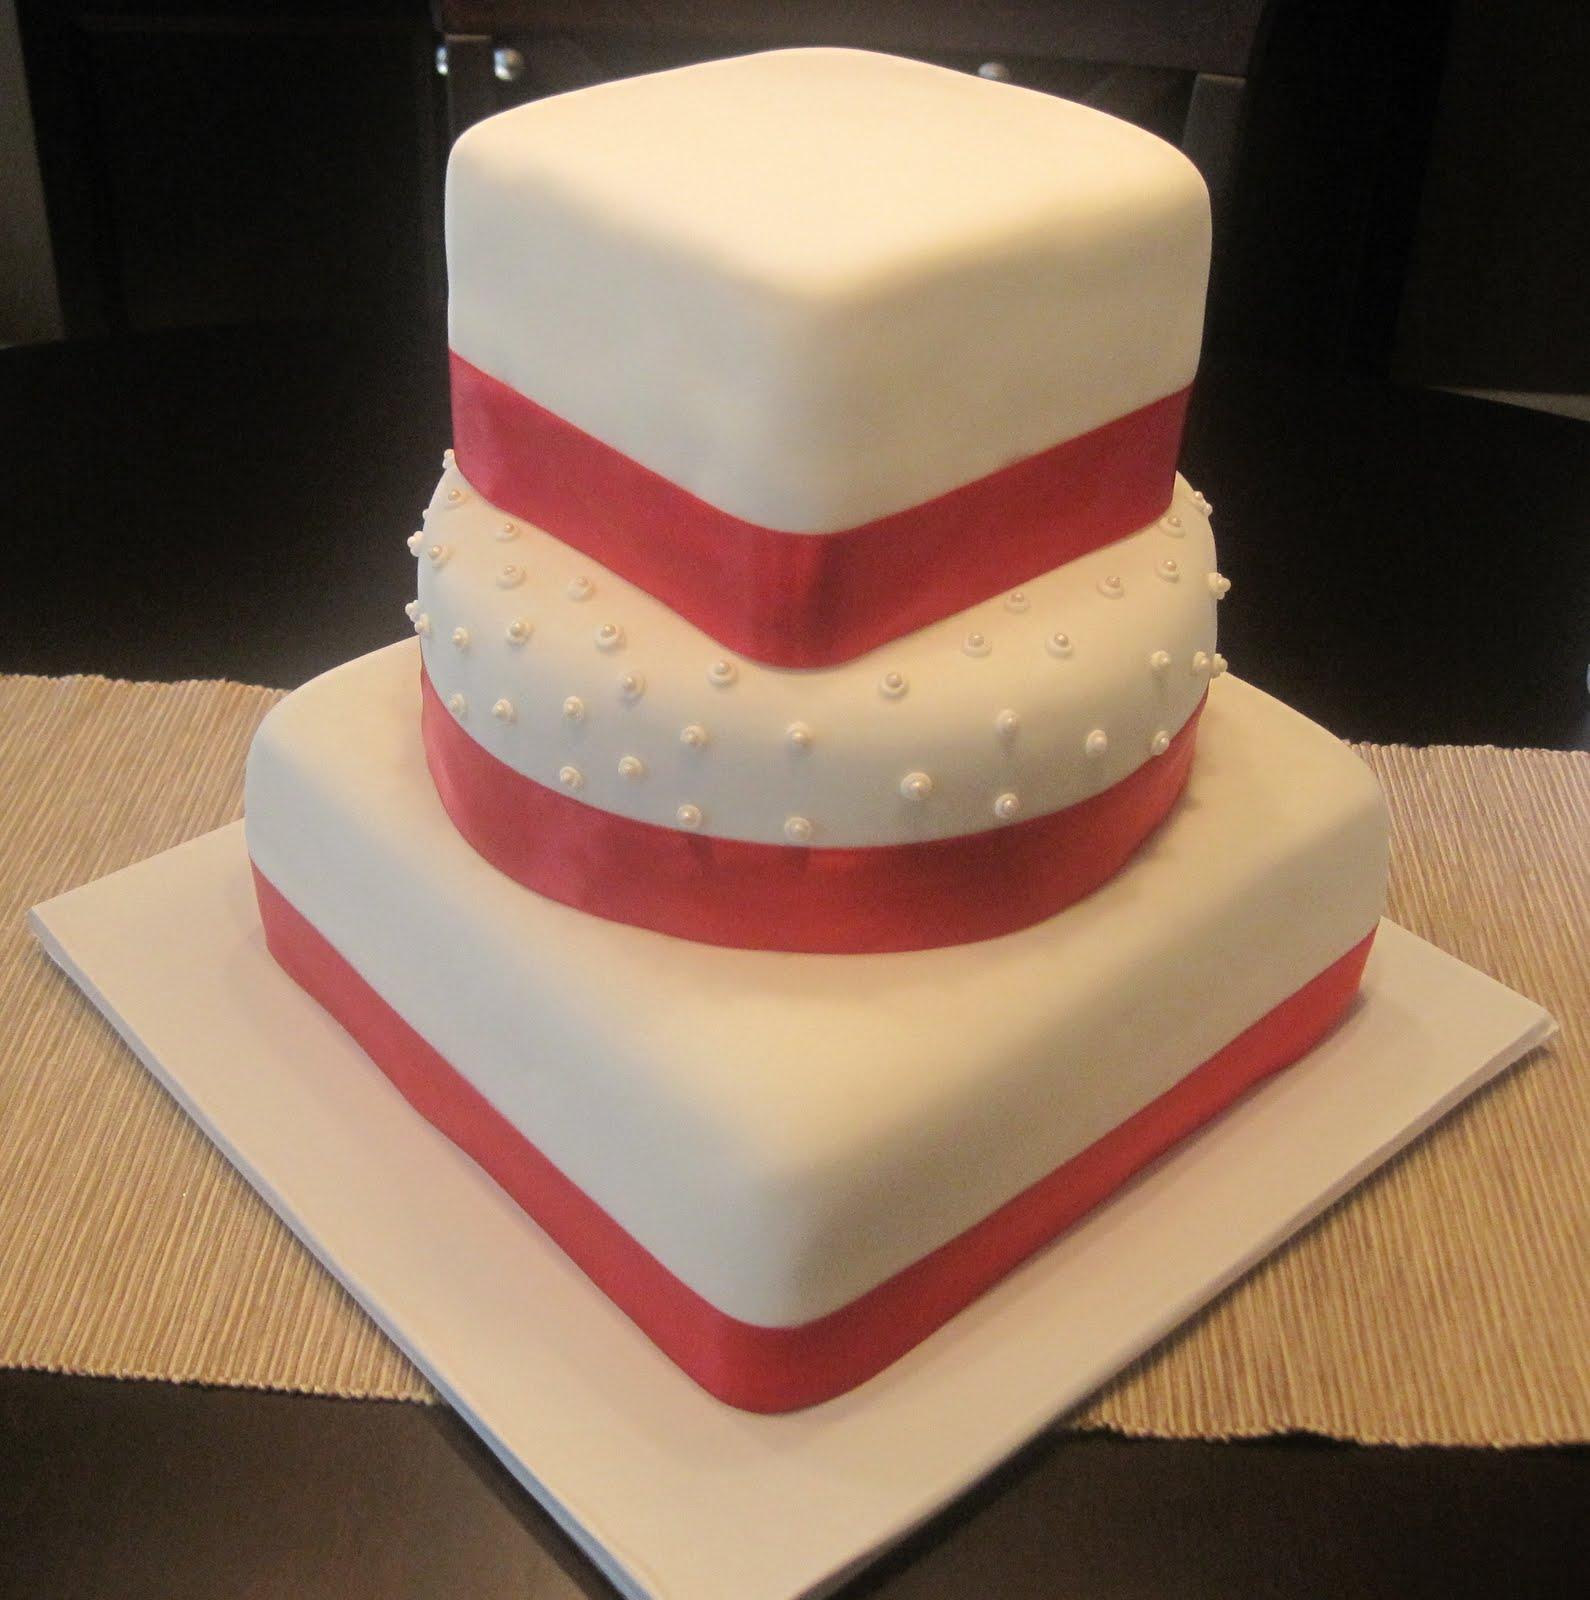 Modern Wedding Cakes: Creative Cakes By Lynn: Red & White Modern Wedding Cake